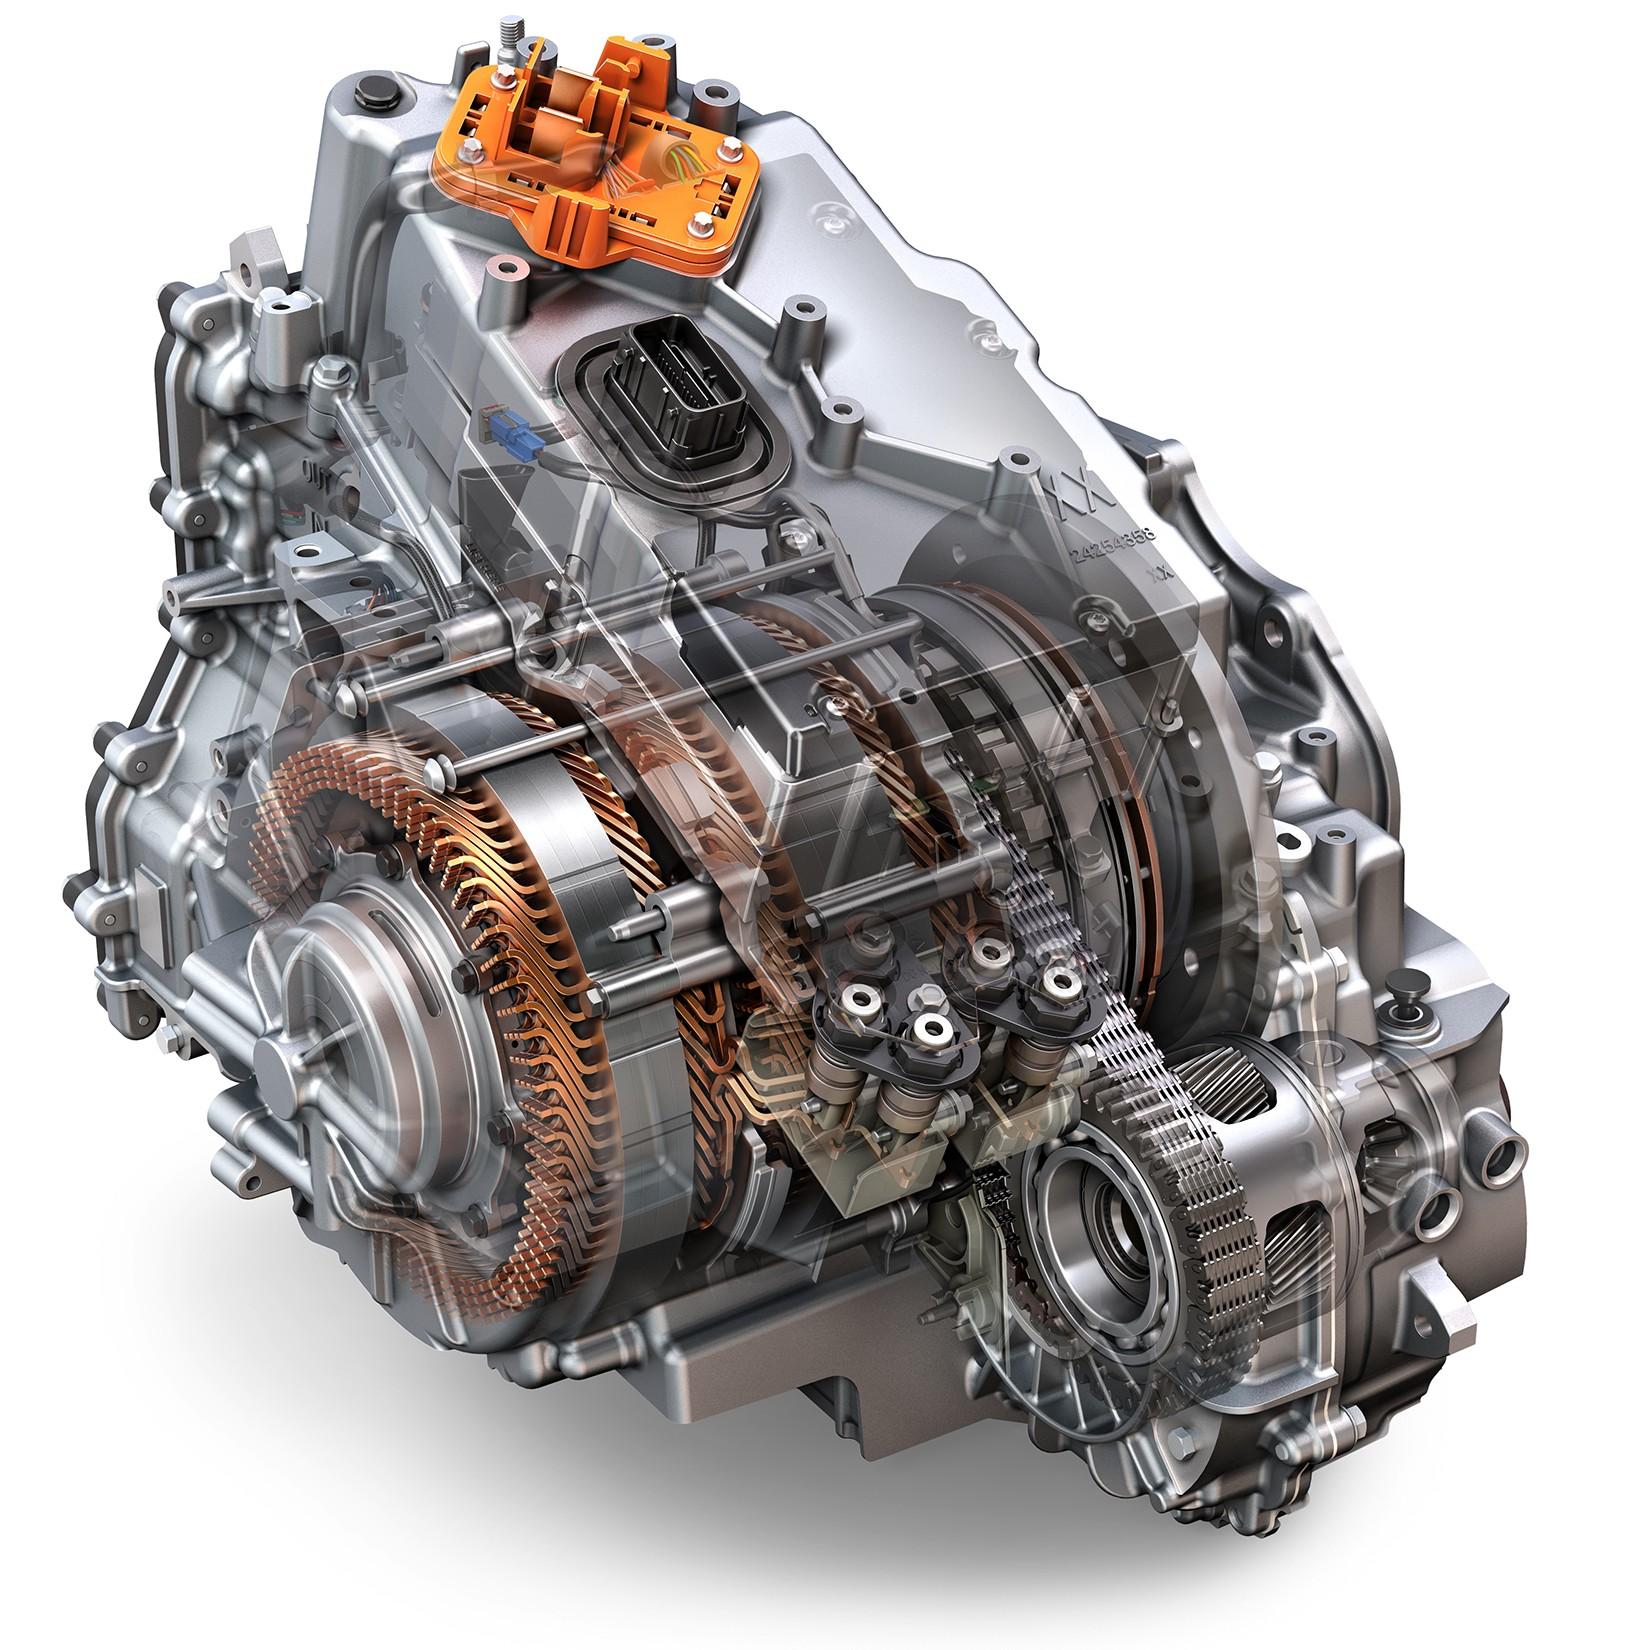 Next Generation Chevrolet Volt Gets 1 5 Litre Range